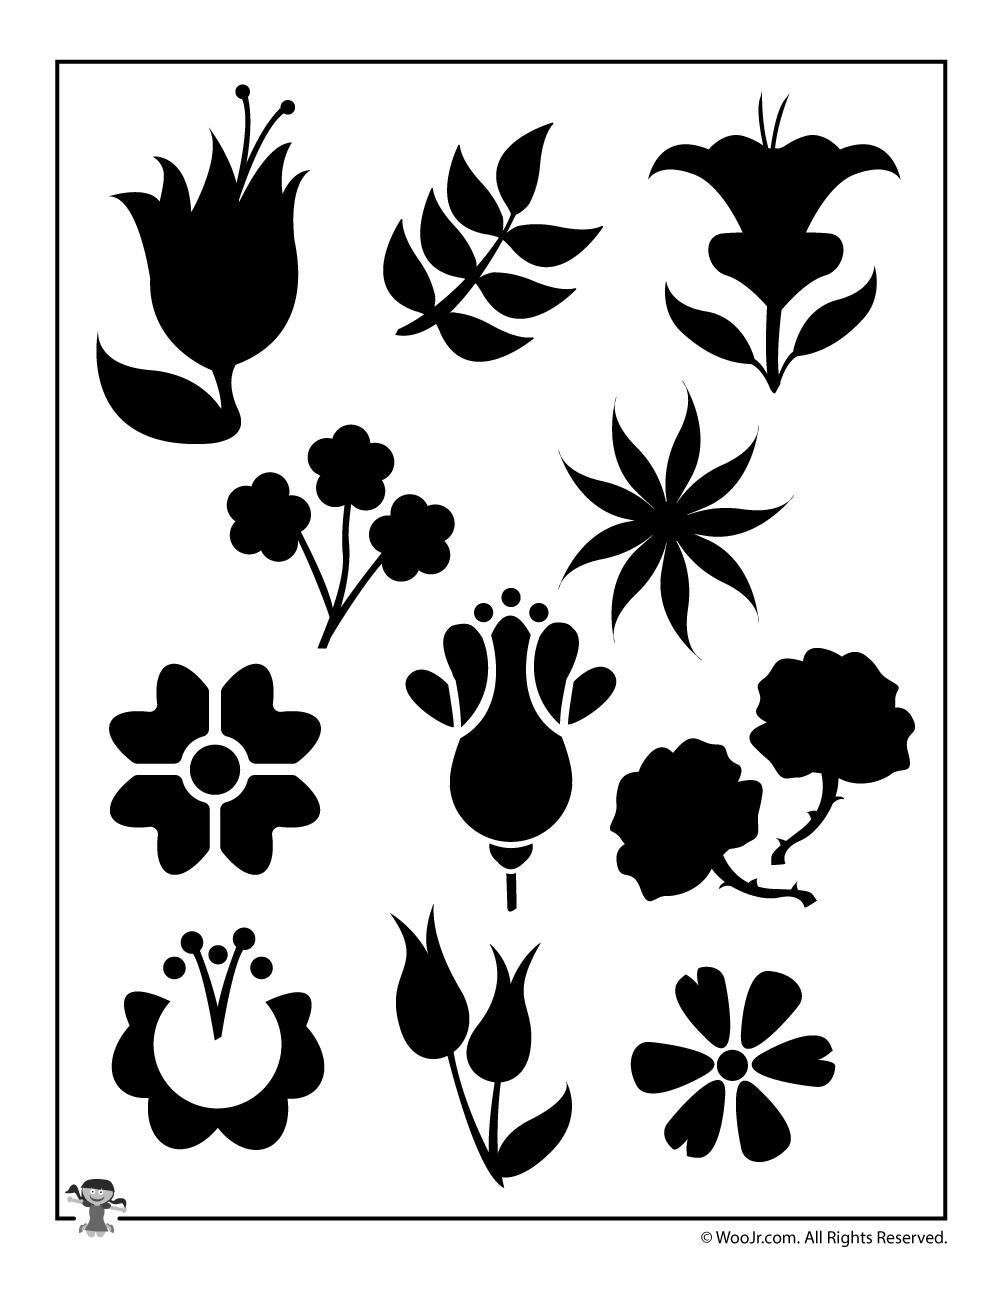 photo regarding Printable Flower Stencil referred to as Printable Flower Stencil Template Established Woo! Jr. Little ones Actions